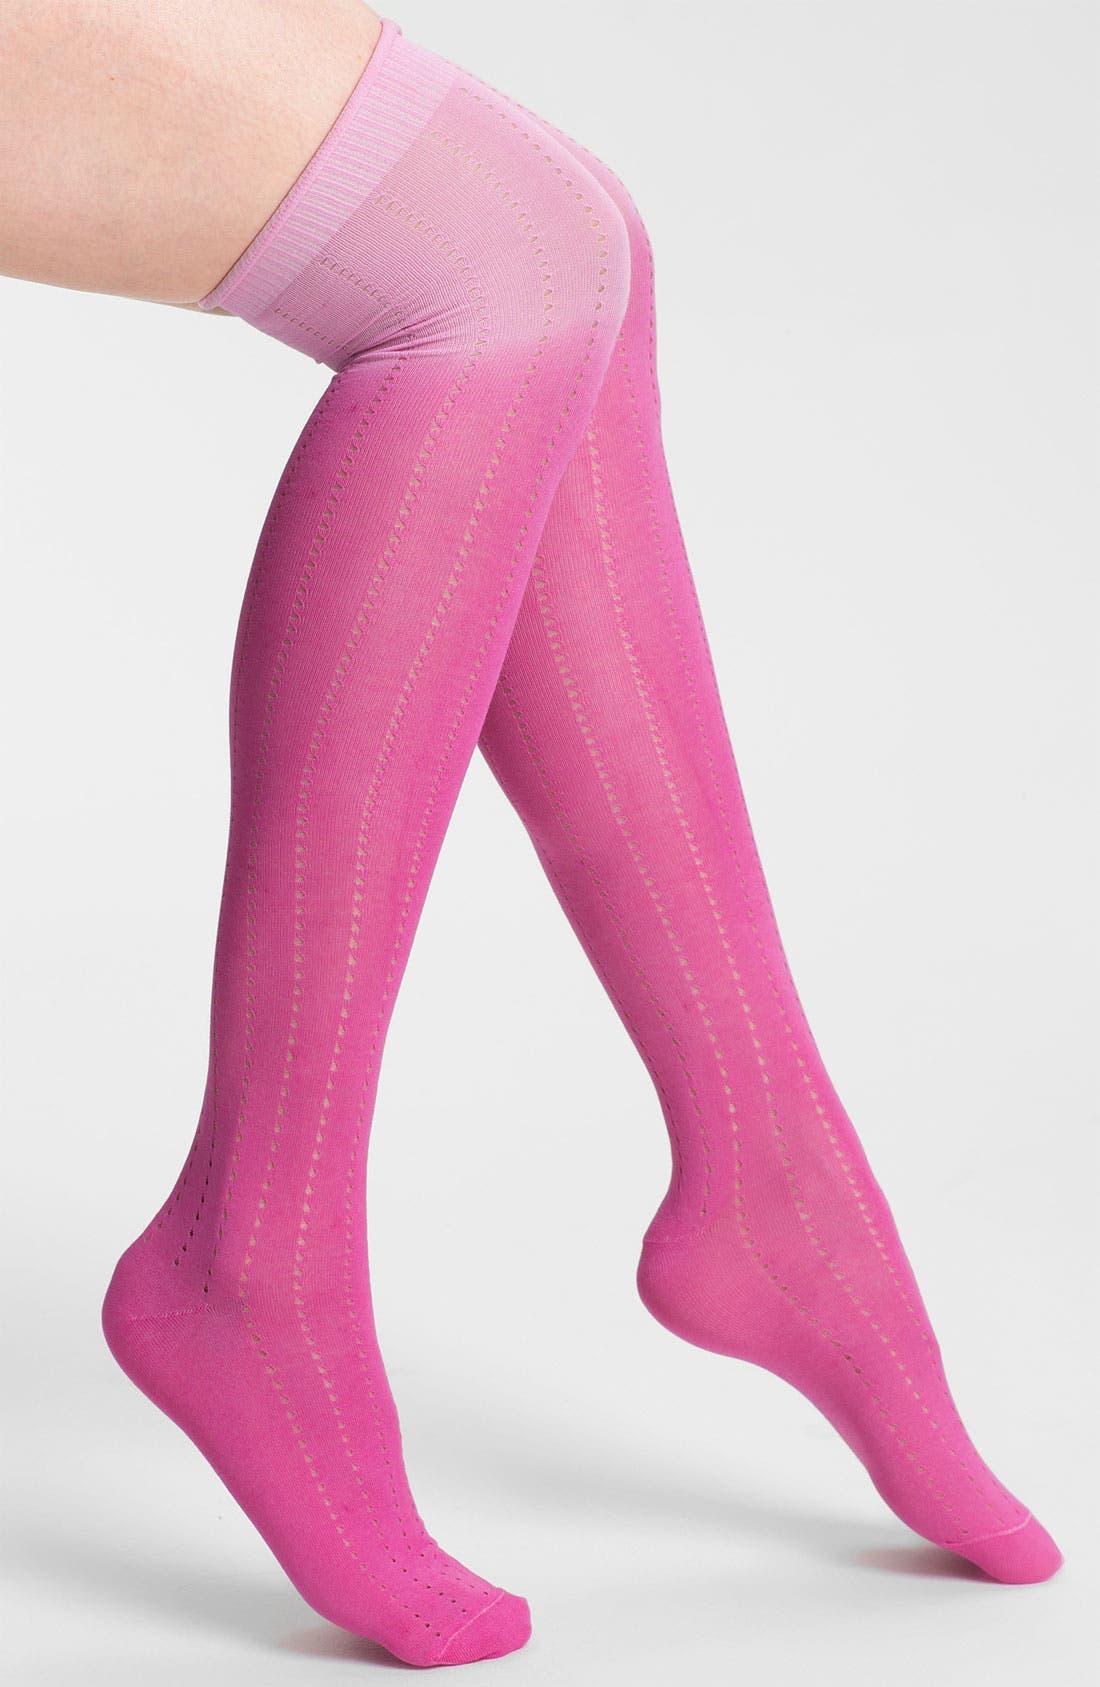 Alternate Image 1 Selected - Nordstrom 'Dip Your Toe In' Over the Knee Socks